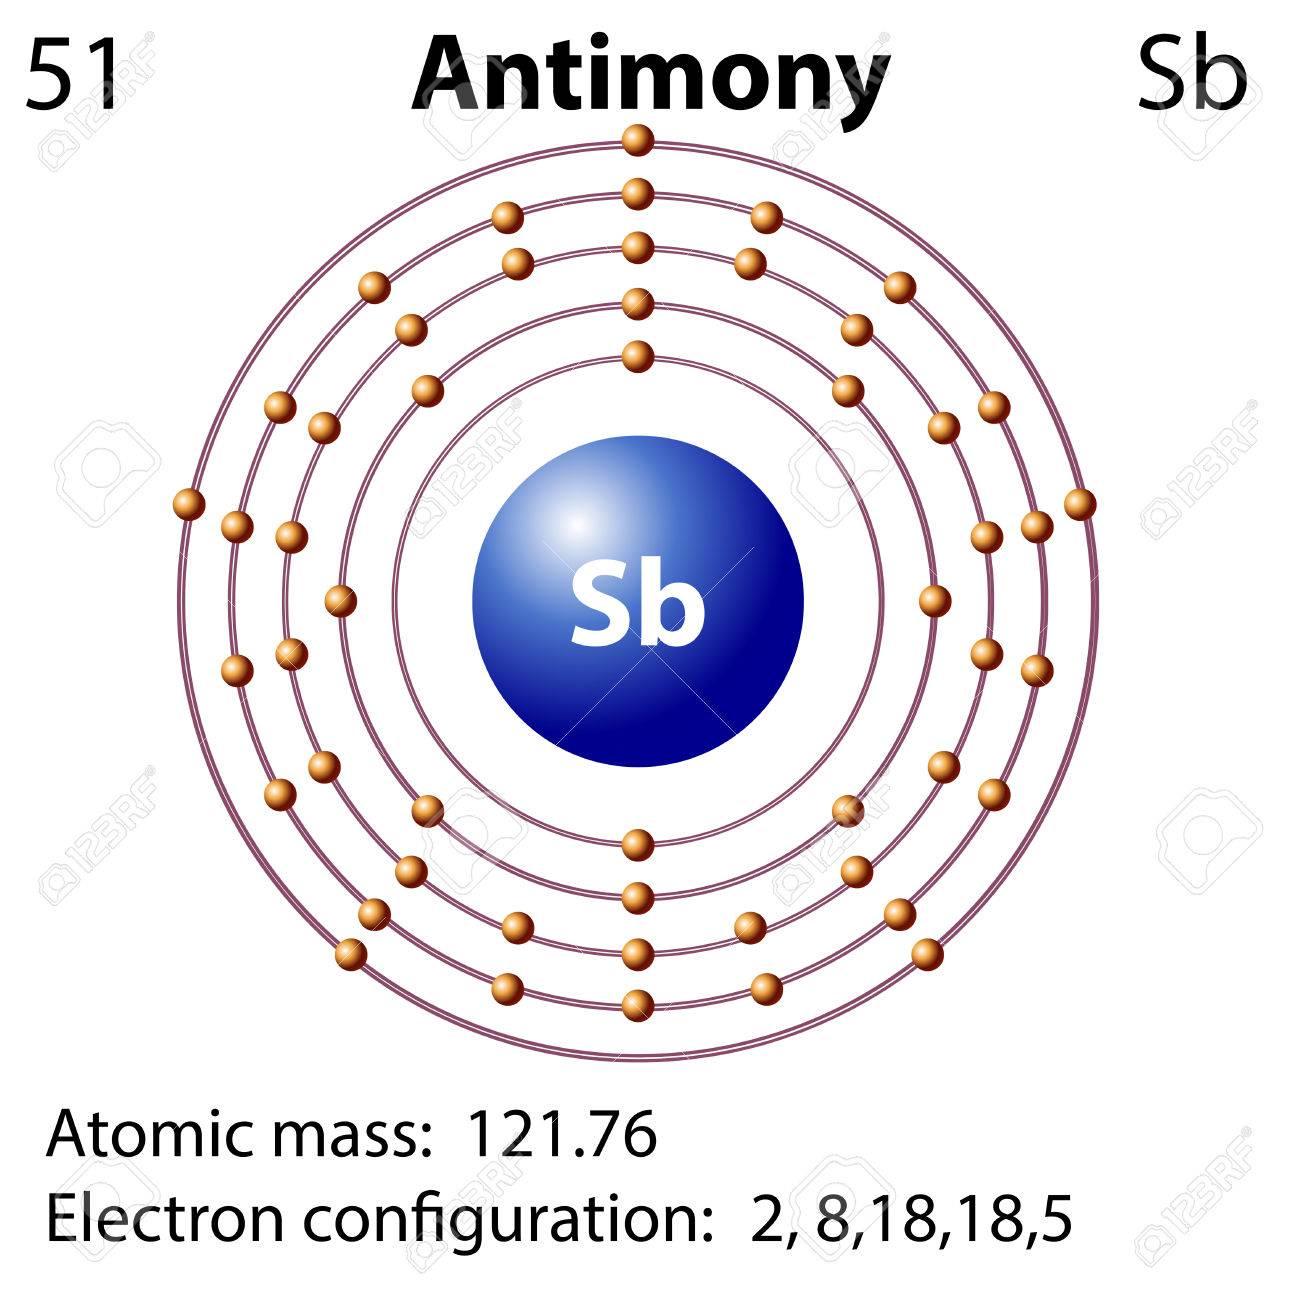 Antimony Atomic Diagram Diy Enthusiasts Wiring Diagrams